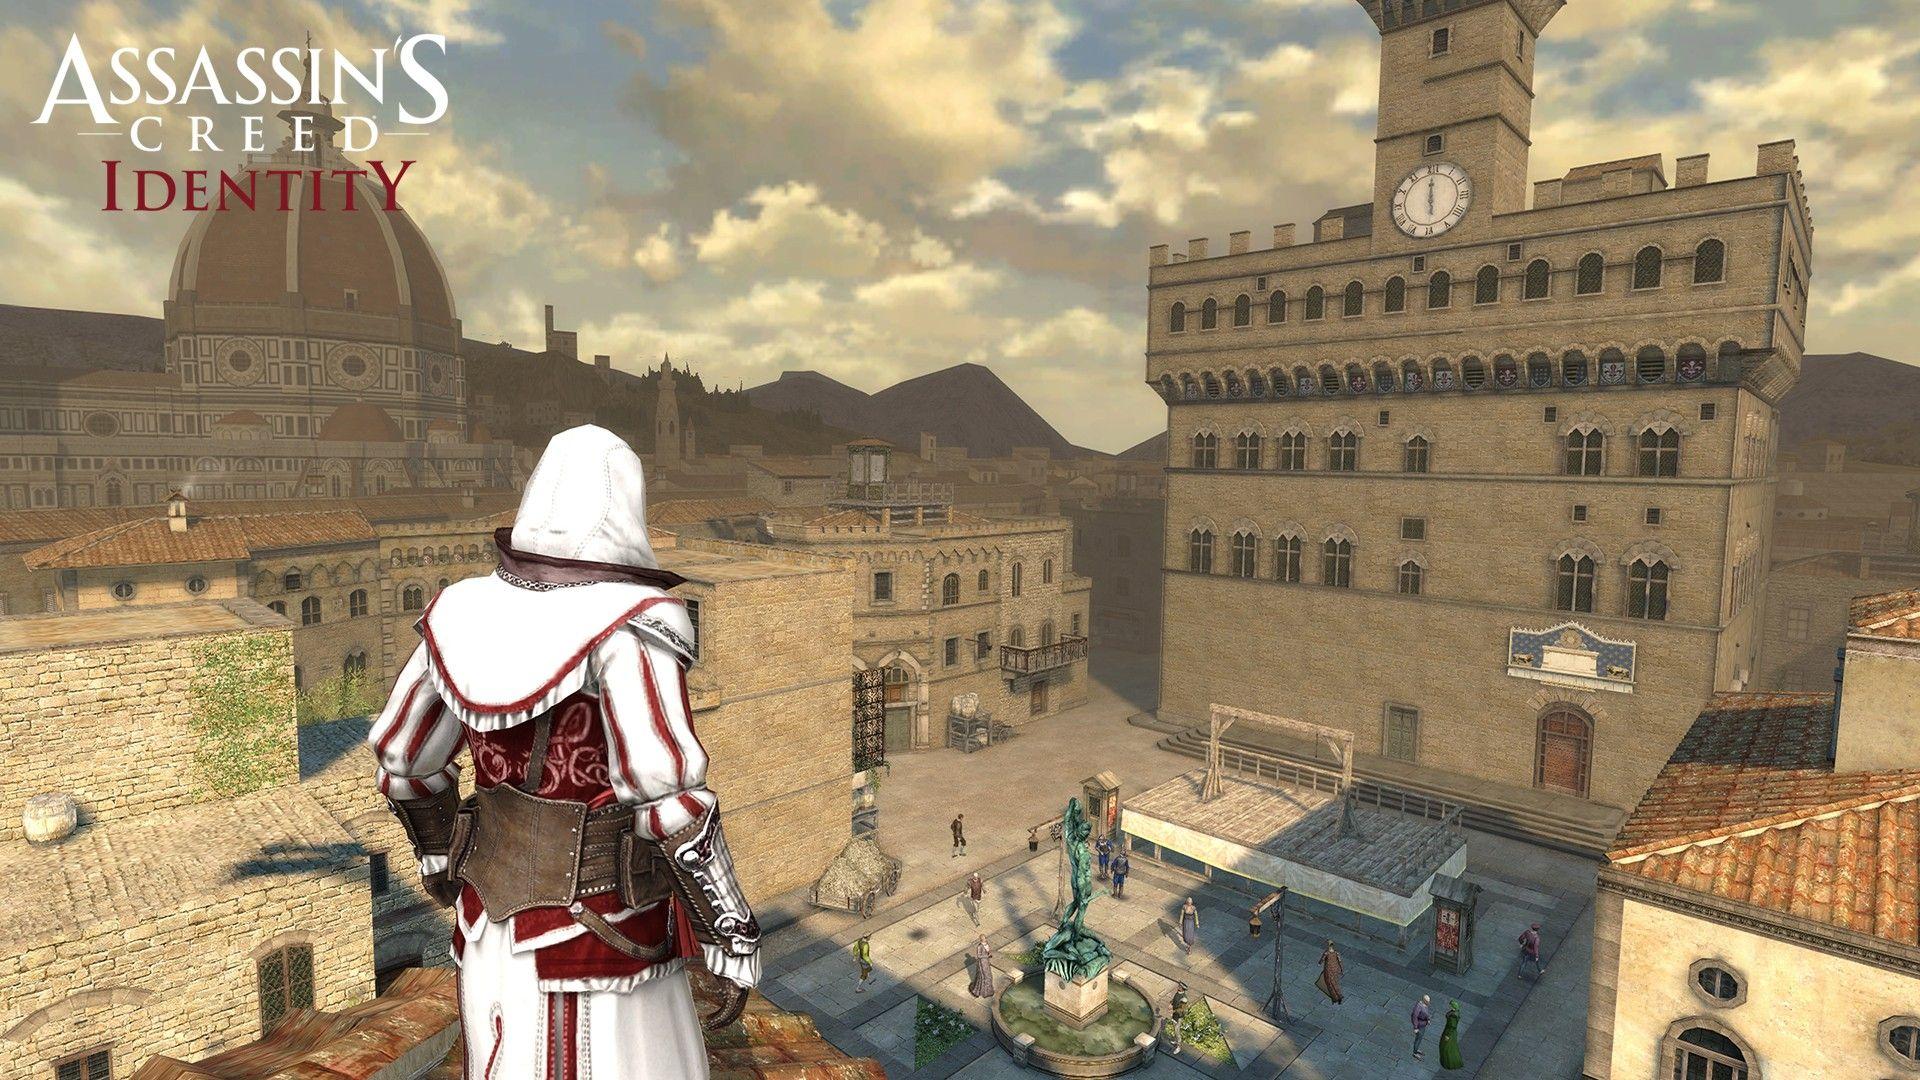 Assassin's Creed Identity 26.02.2016 Passend zum